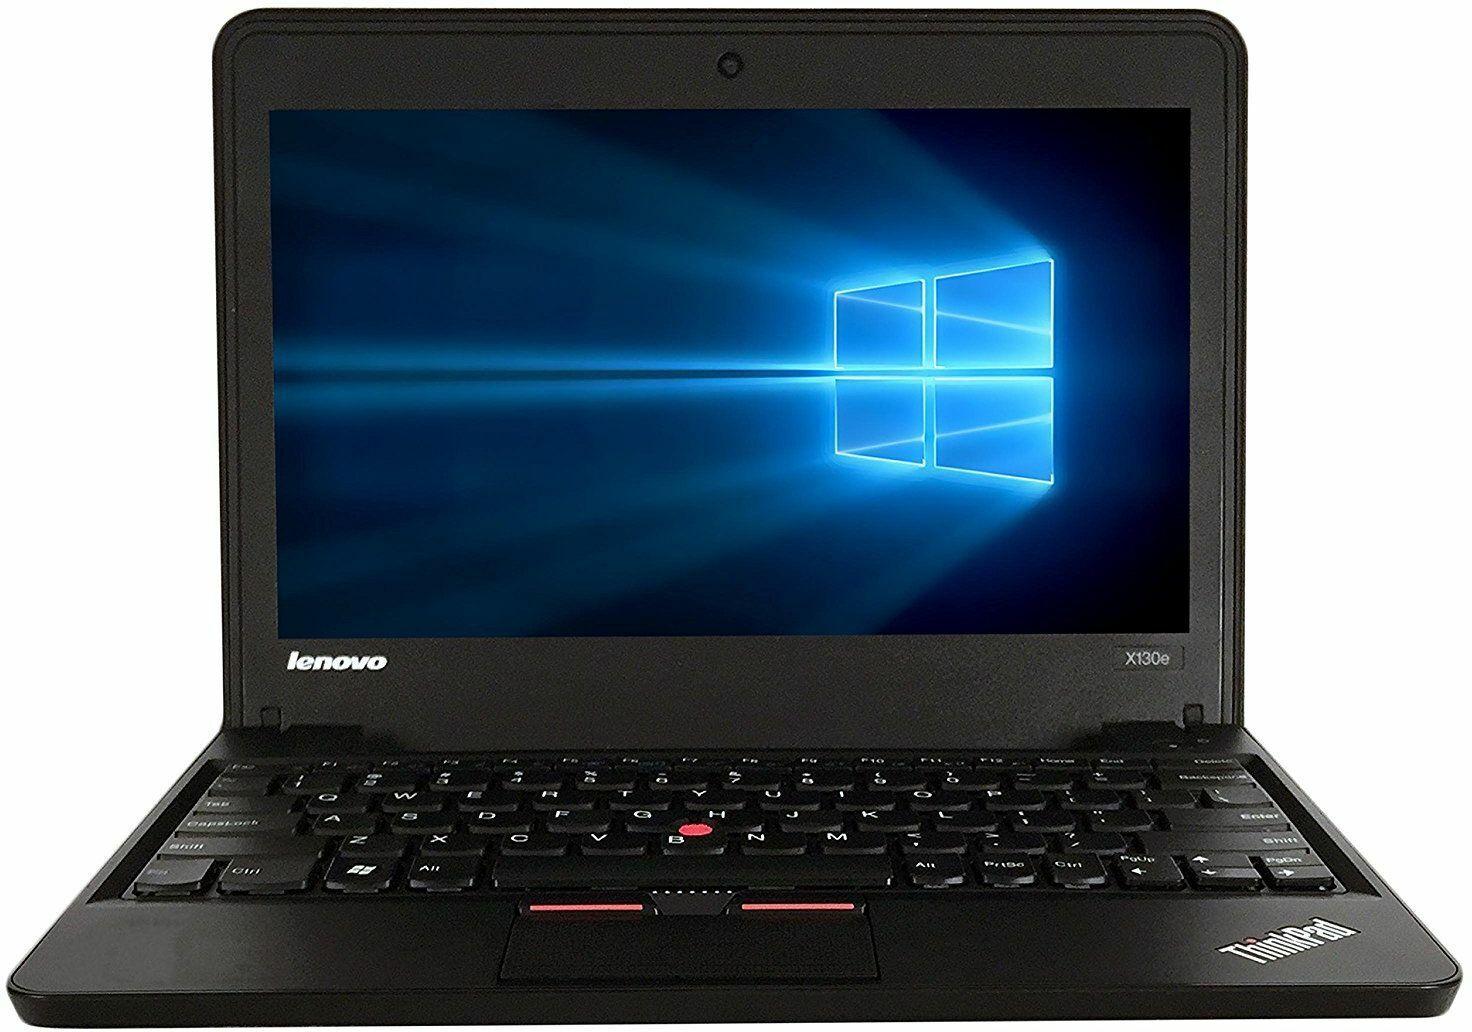 Laptop Windows - LENOVO X131E GLOSSY RED DUAL CORE 4gb 128gb SSD WEBCAM USB 3 WINDOWS 10 PRO